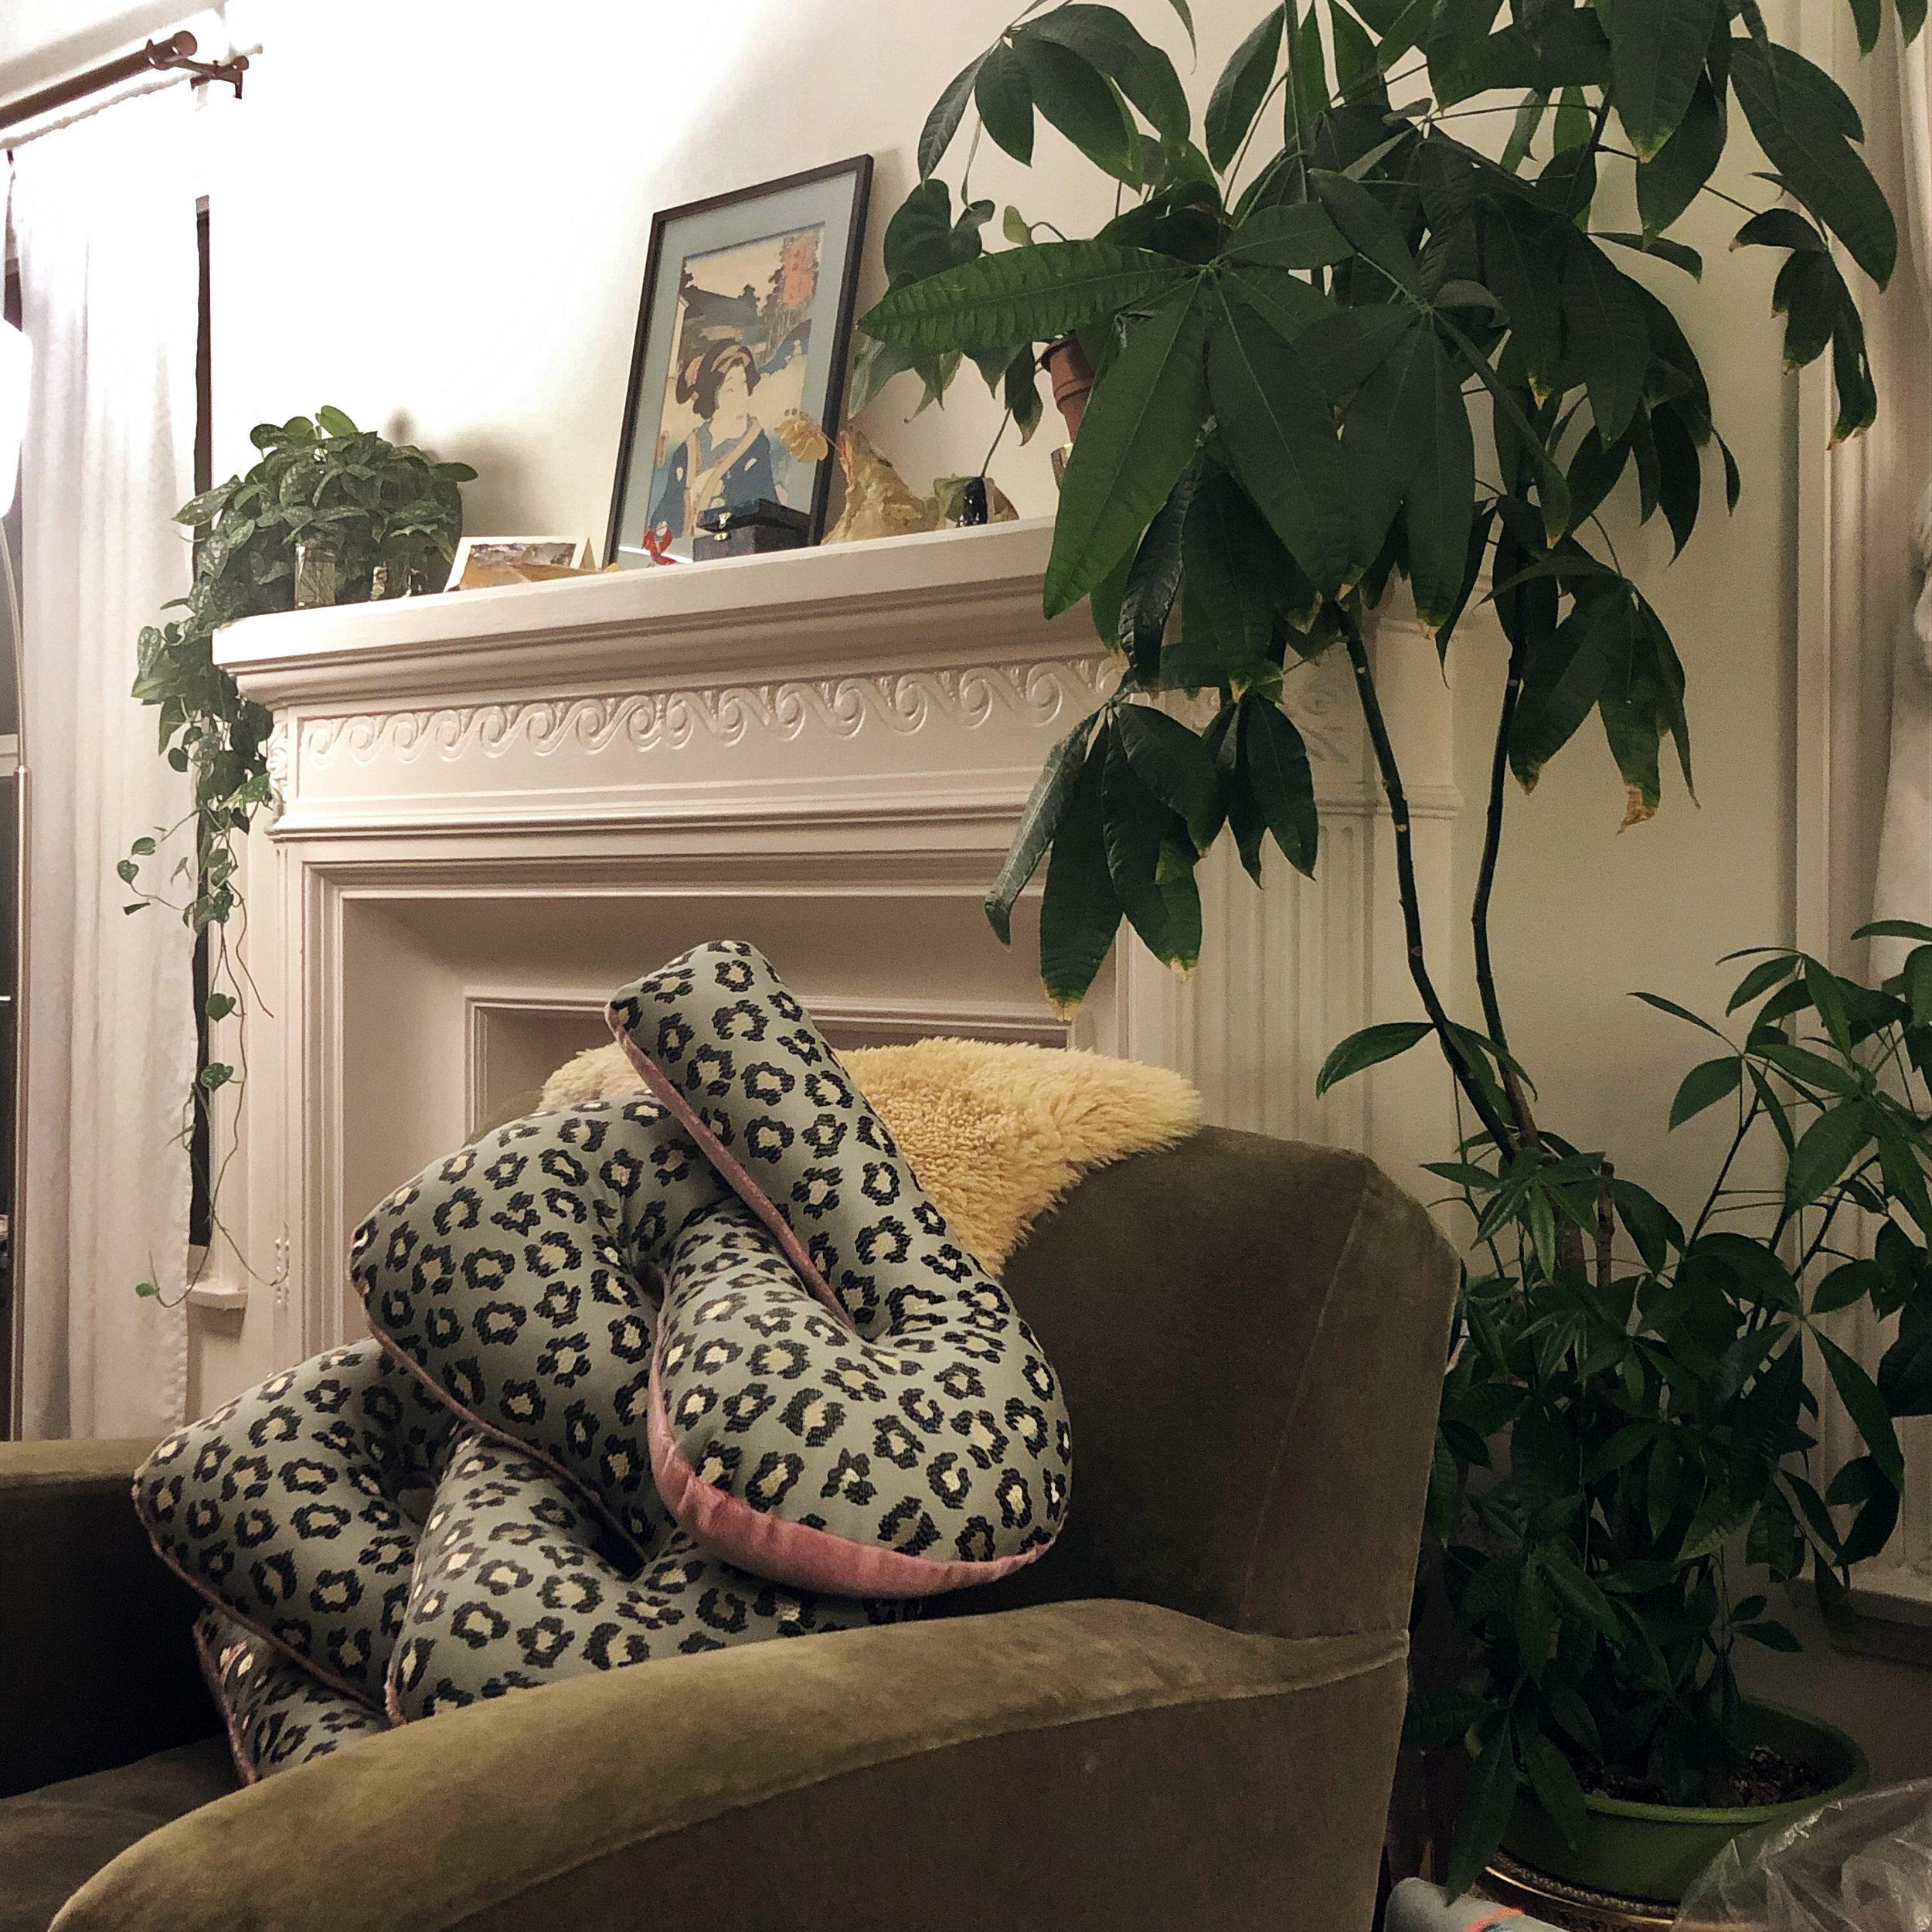 MN Pink and Cheetah Squiggle Pillow RG.jpg